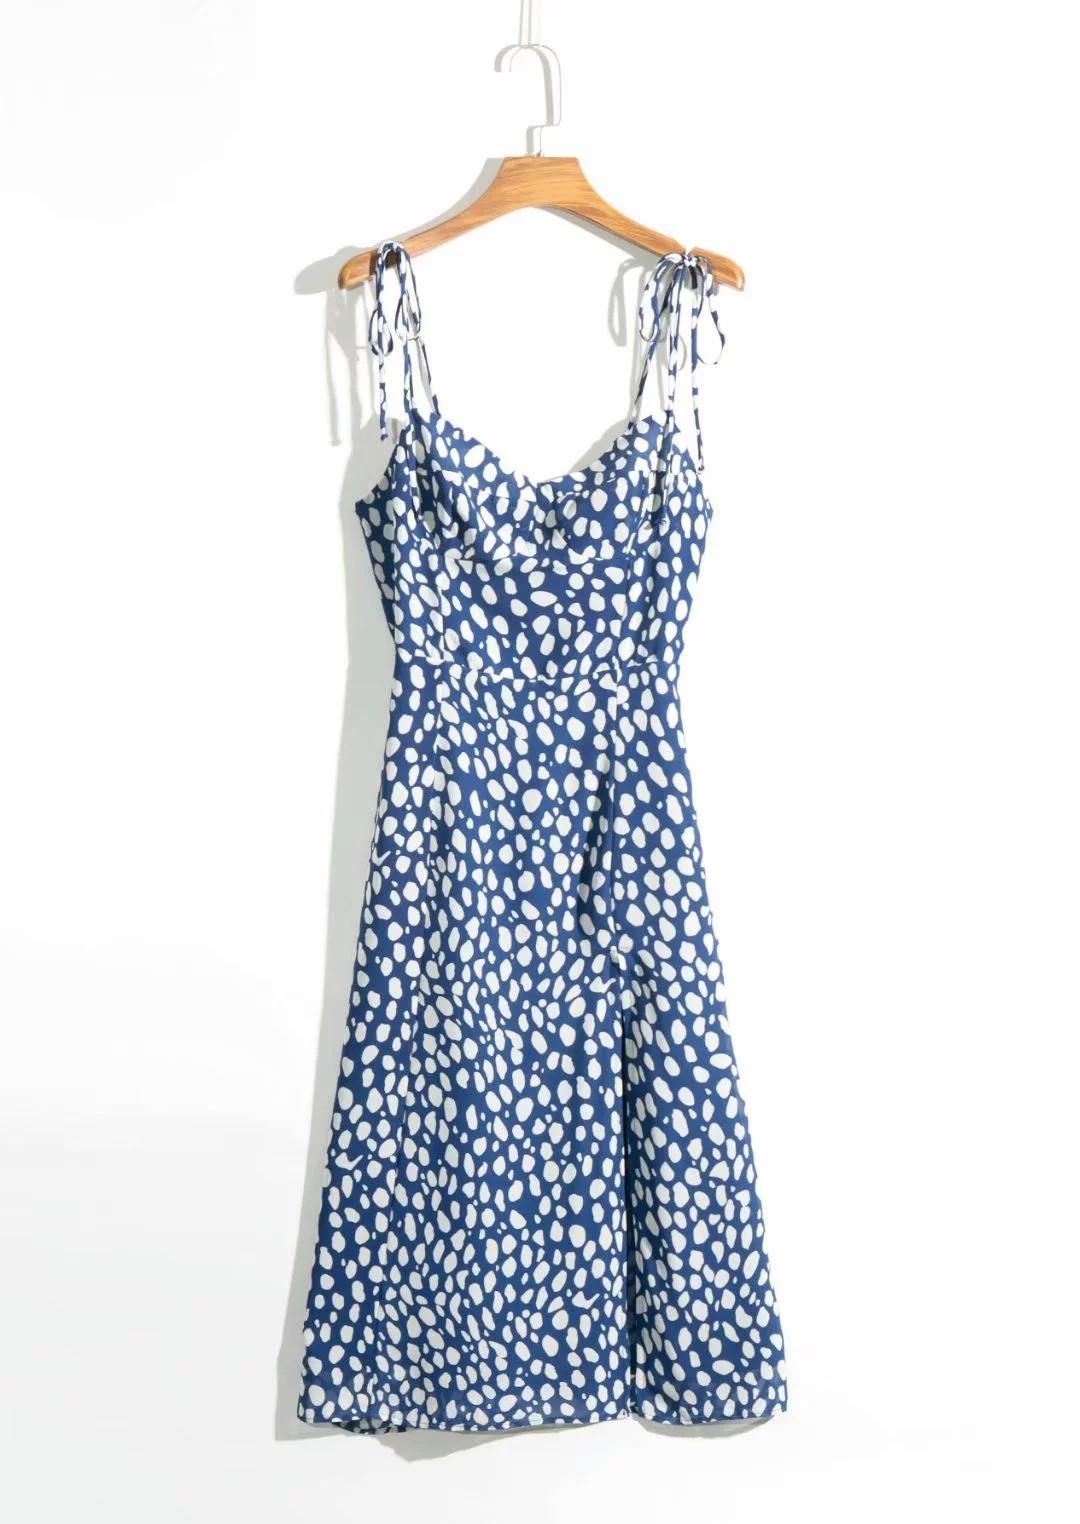 KHG0805X Dress